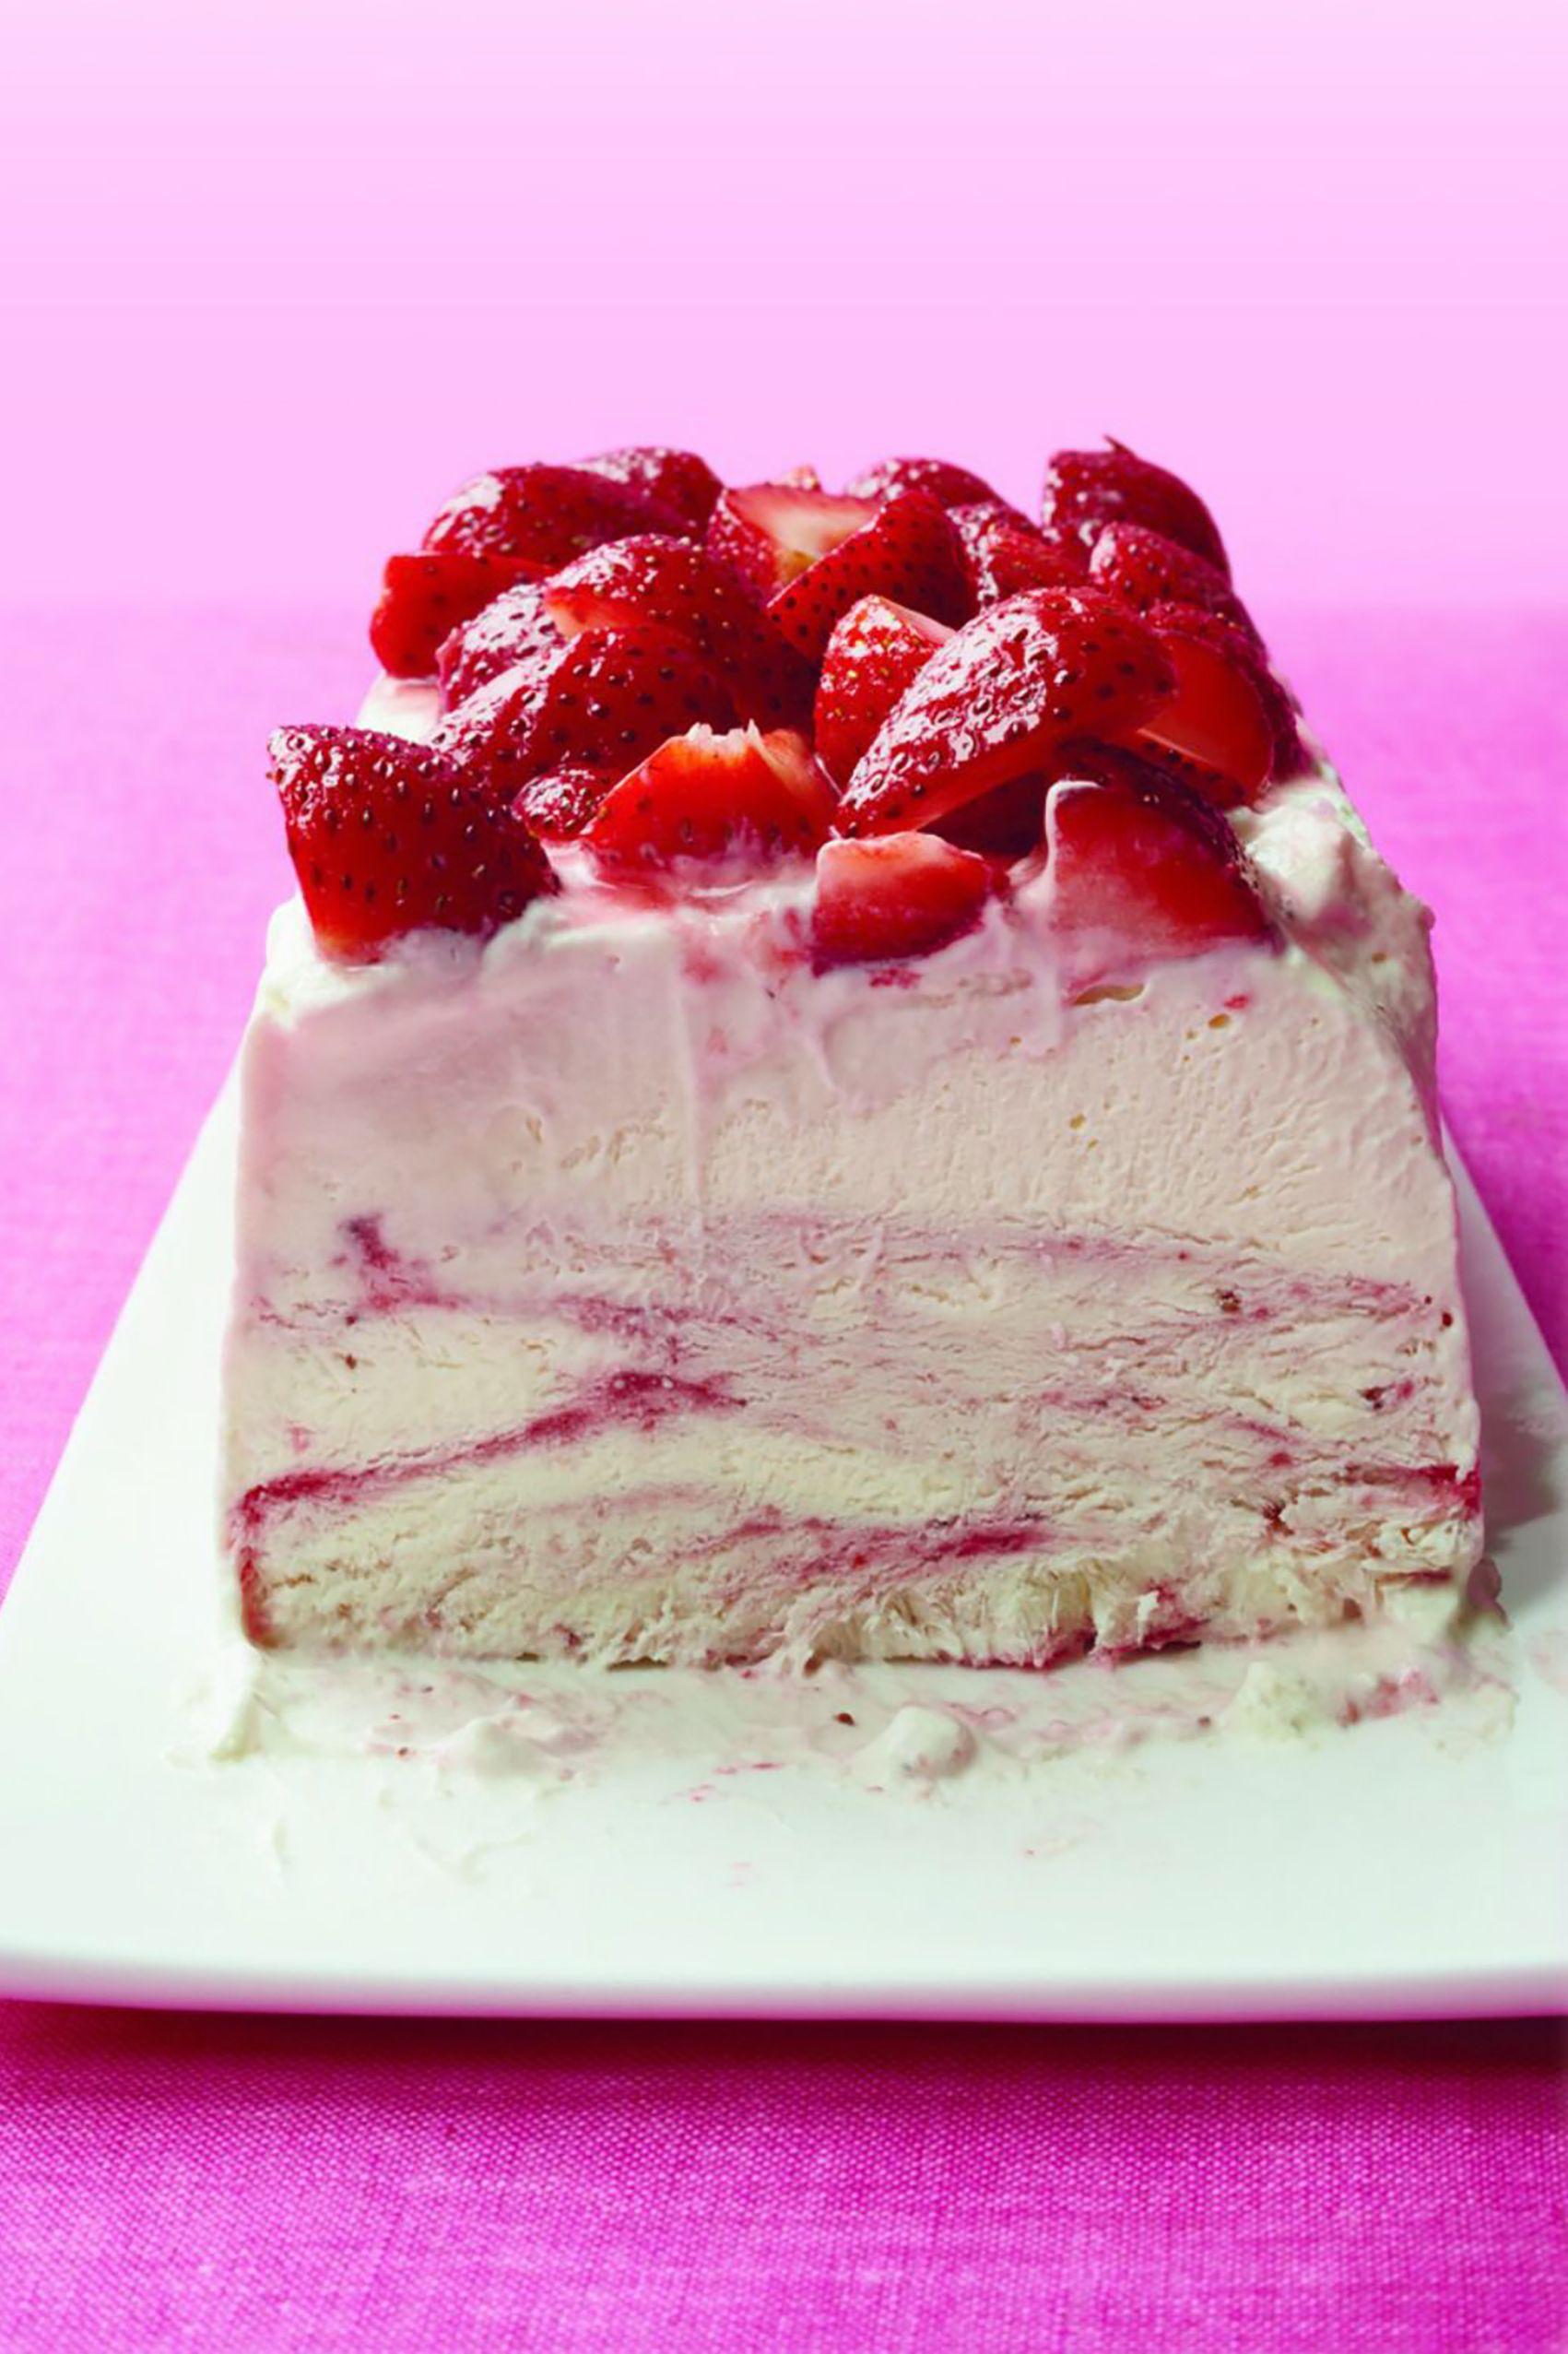 Gluten Free Desserts - Strawberry Ice Cream Cheesecake